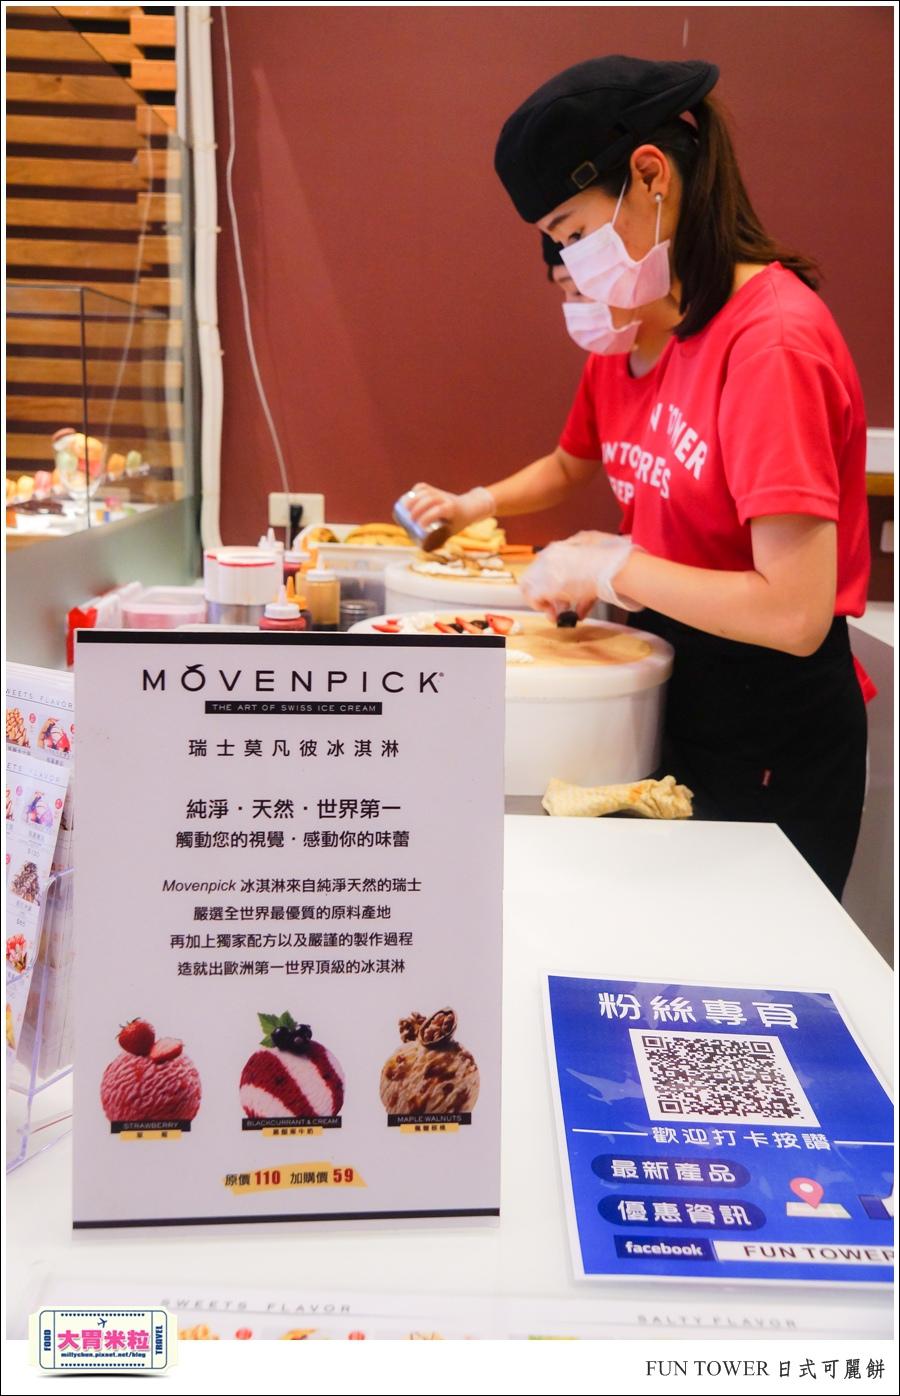 FUN TOWER日式可麗餅(高雄明華店)@高雄可麗餅甜點推薦@大胃米粒0018.jpg